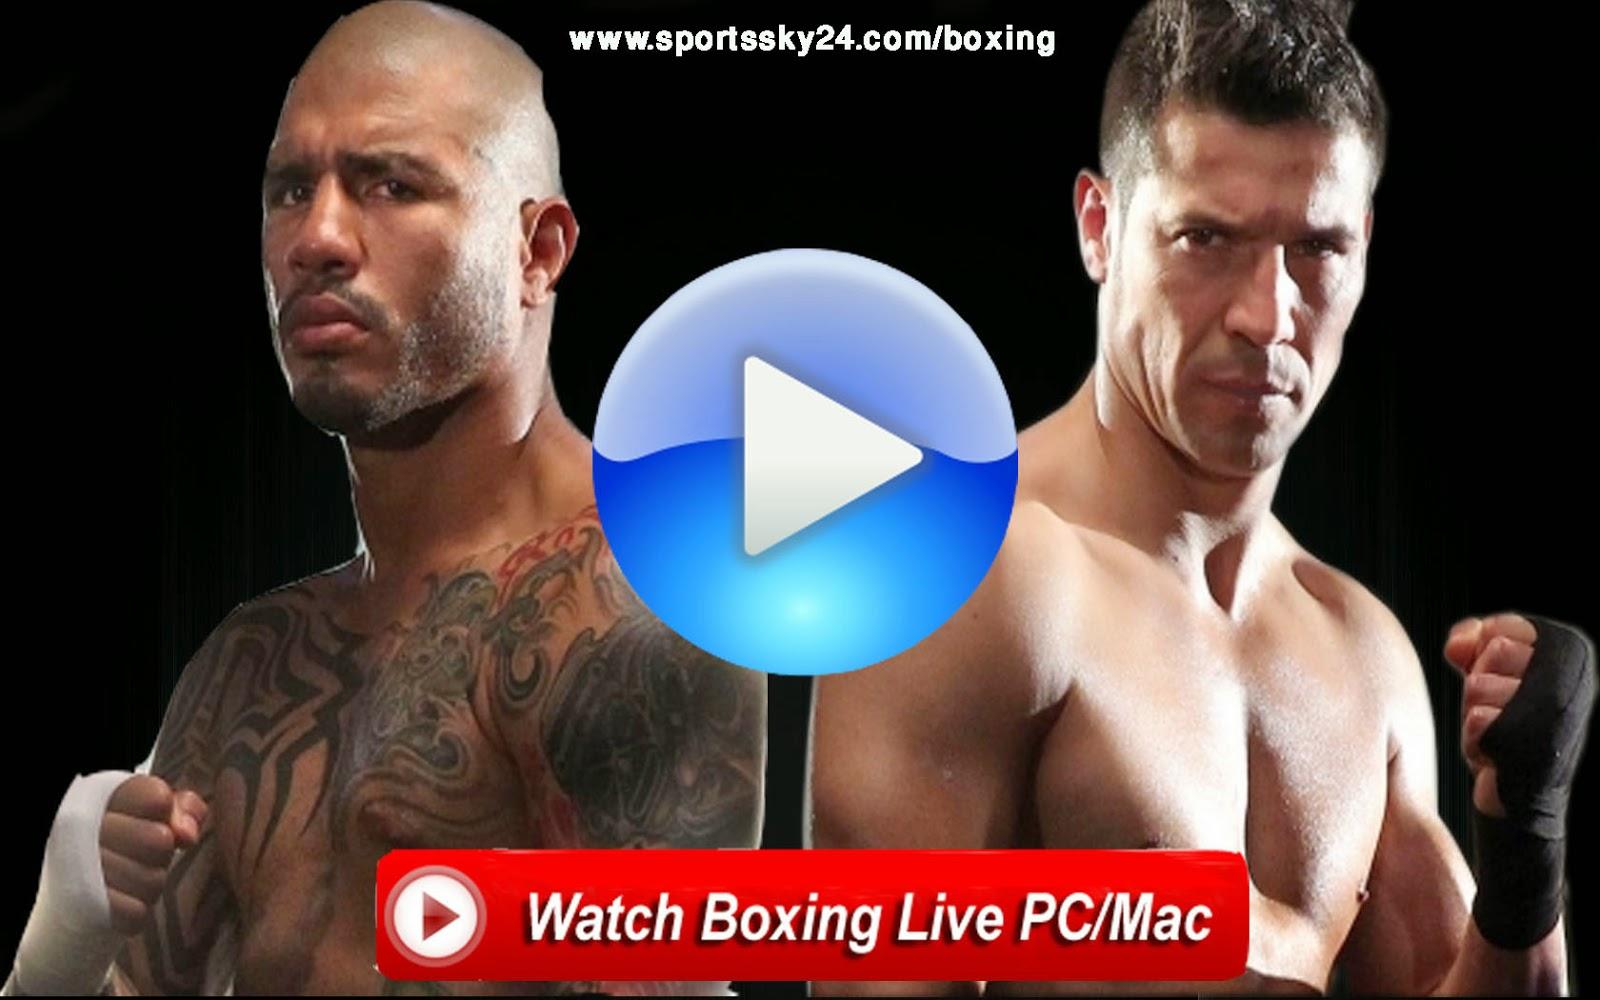 http://www.sportssky24.com/boxing